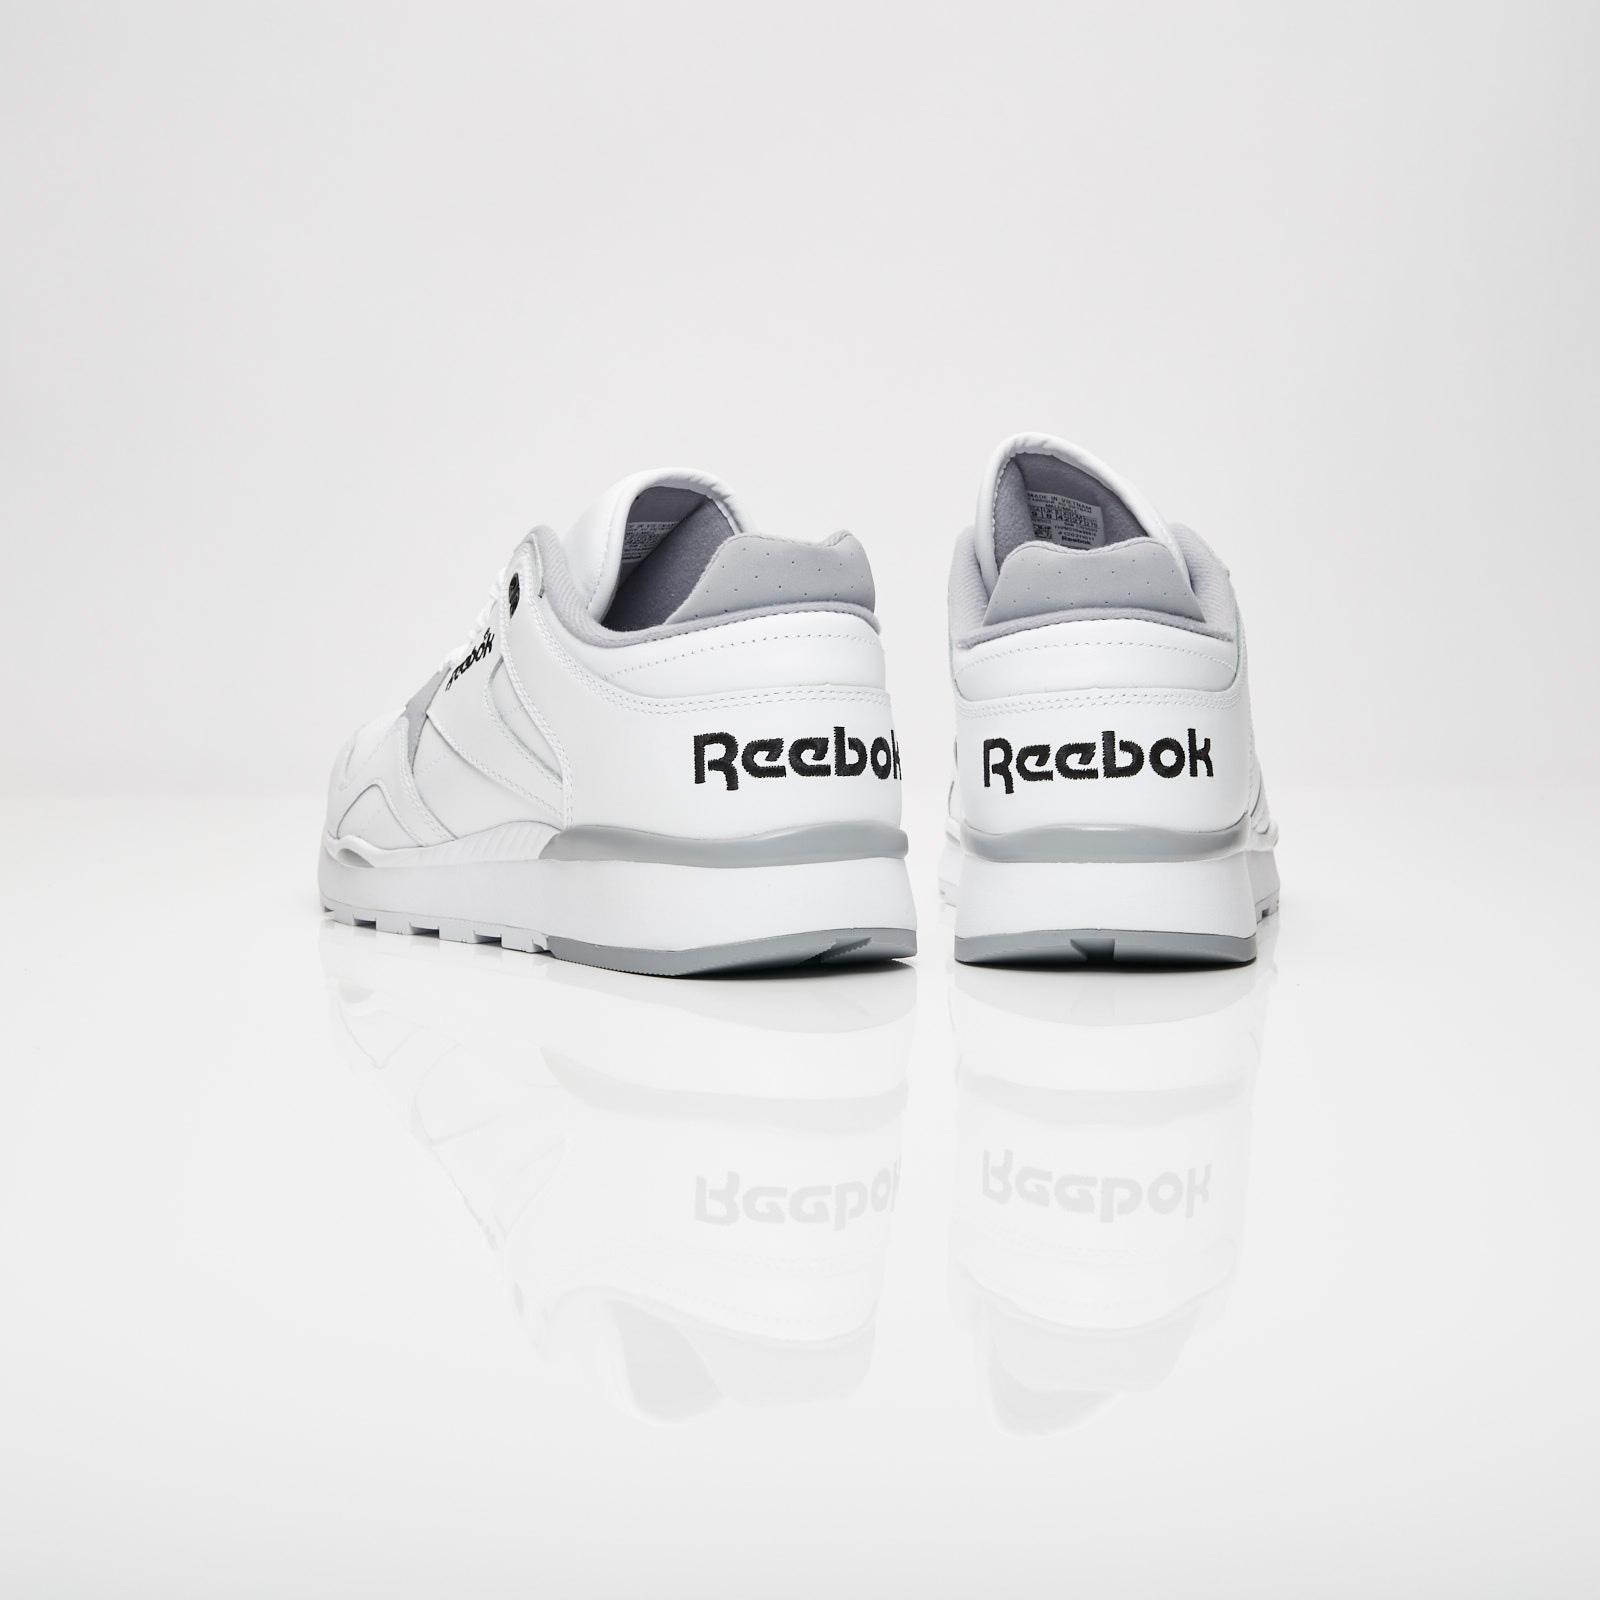 02cb6ce0552 Reebok Cl Leather II - Cn3899 - Sneakersnstuff